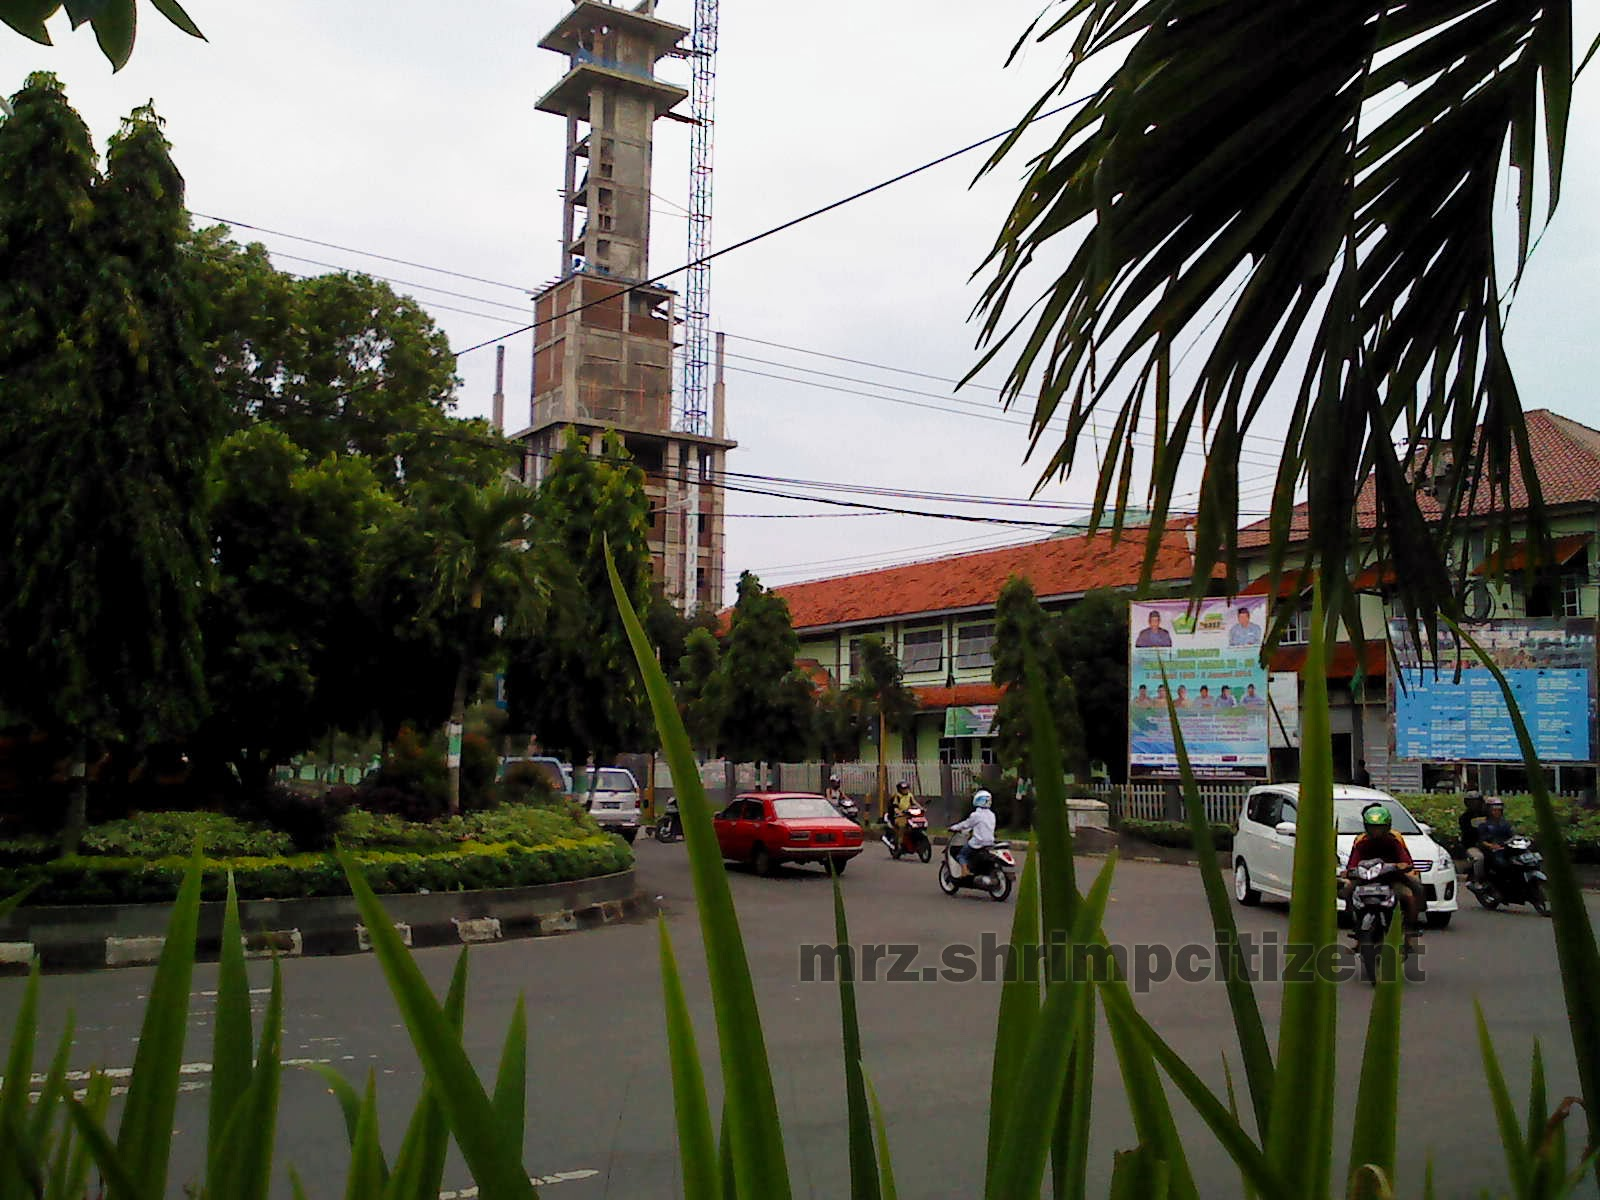 Pembangunan Menara Masjid Agung Sumber, Kab. Cirebon 4